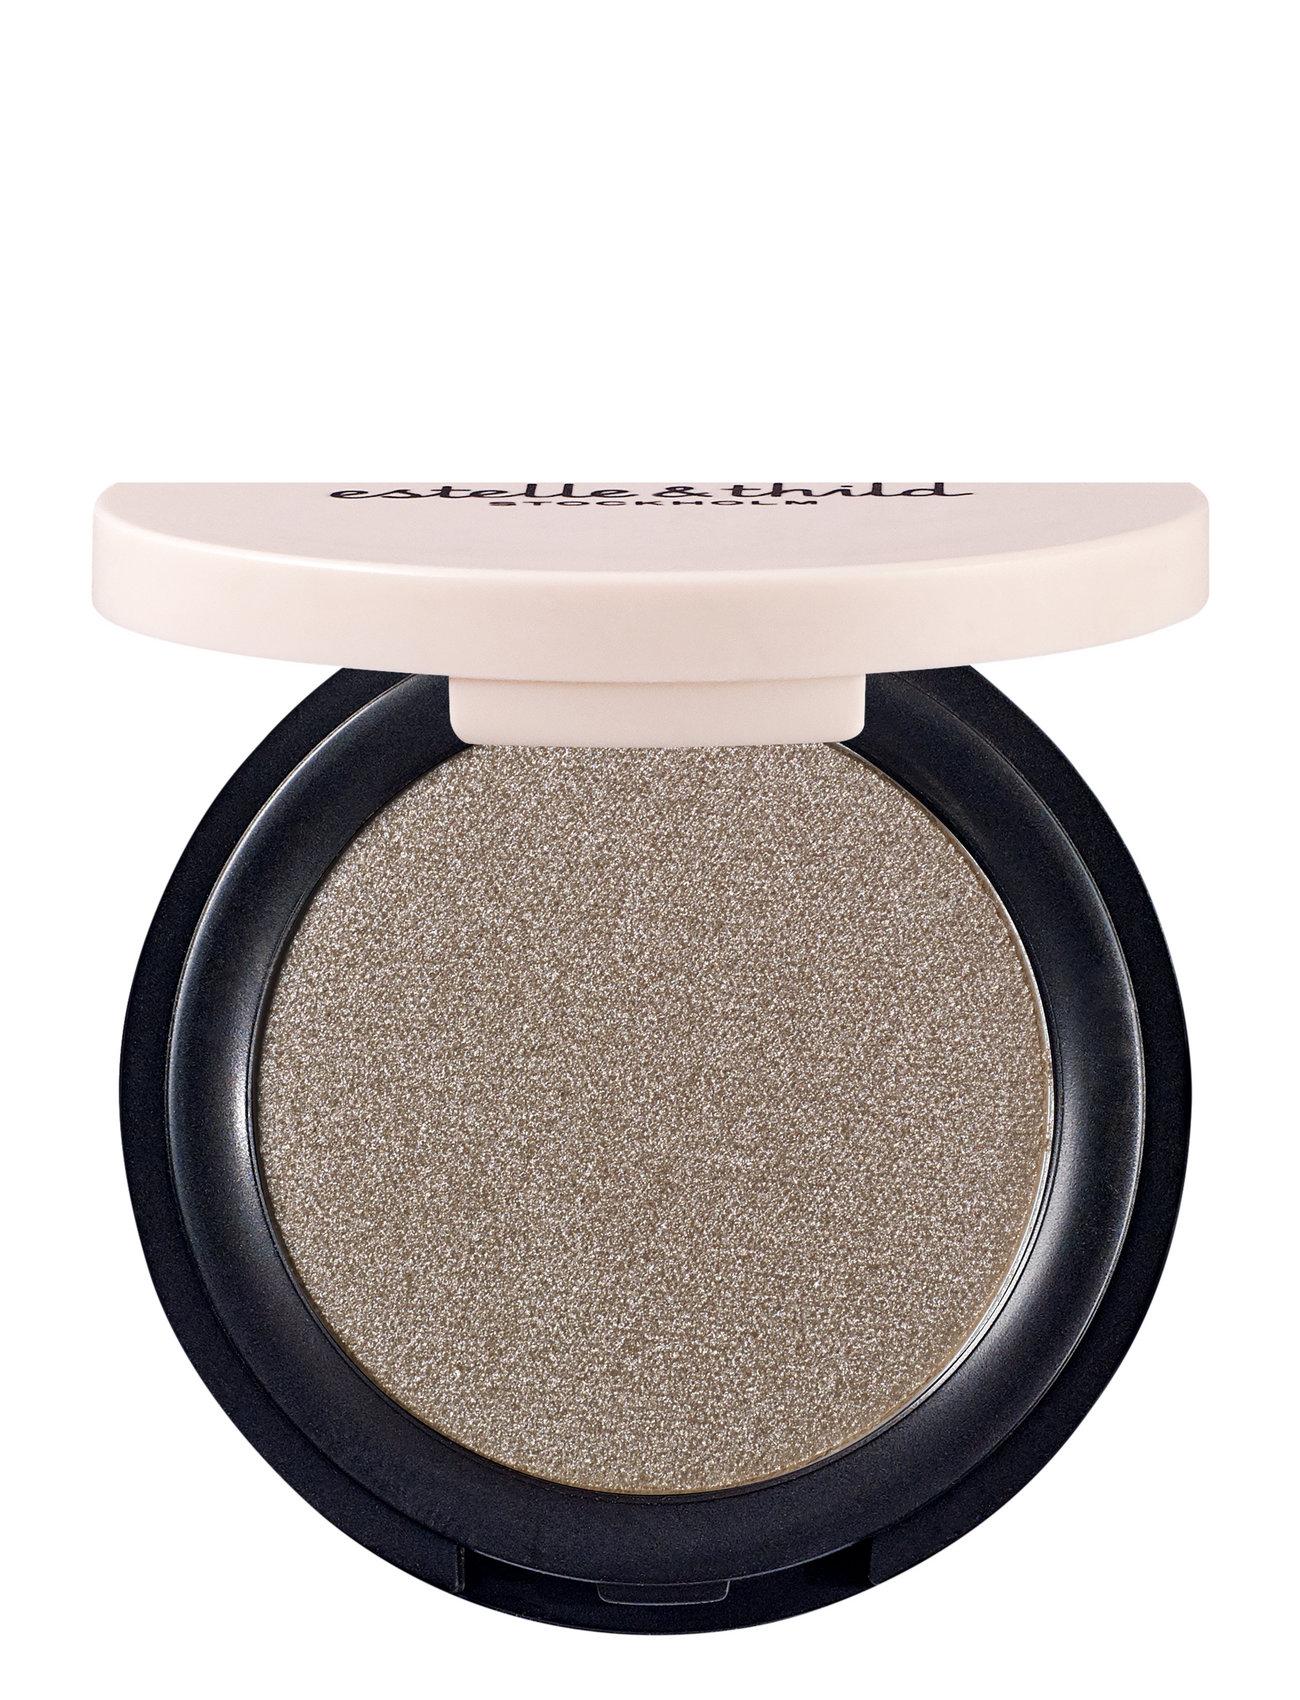 Biomineral Silky Eyeshadow Bare - Estelle & Thild